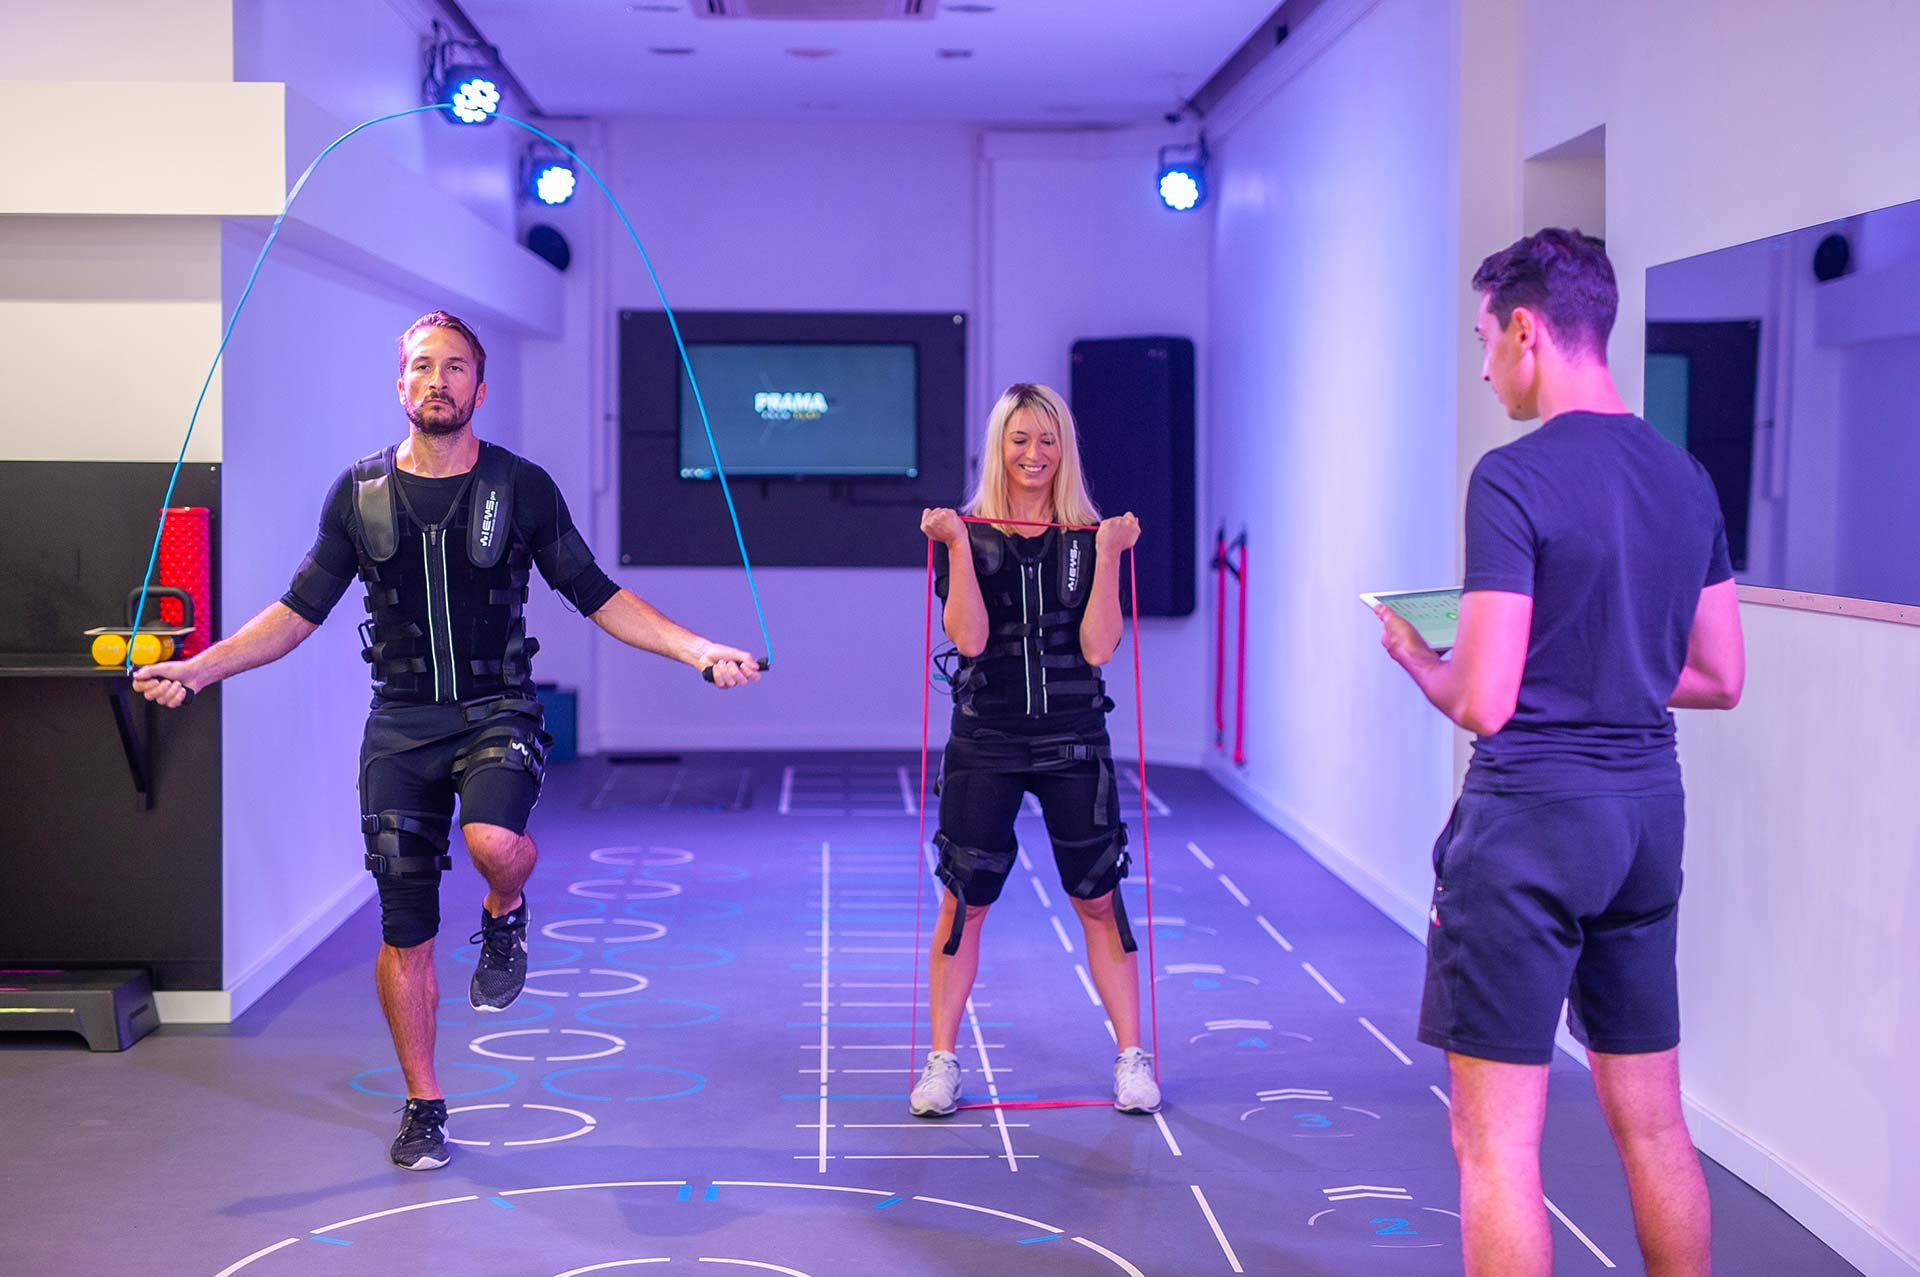 Salle De Sport Electrostimulation Fitness A Lyon Intensifit